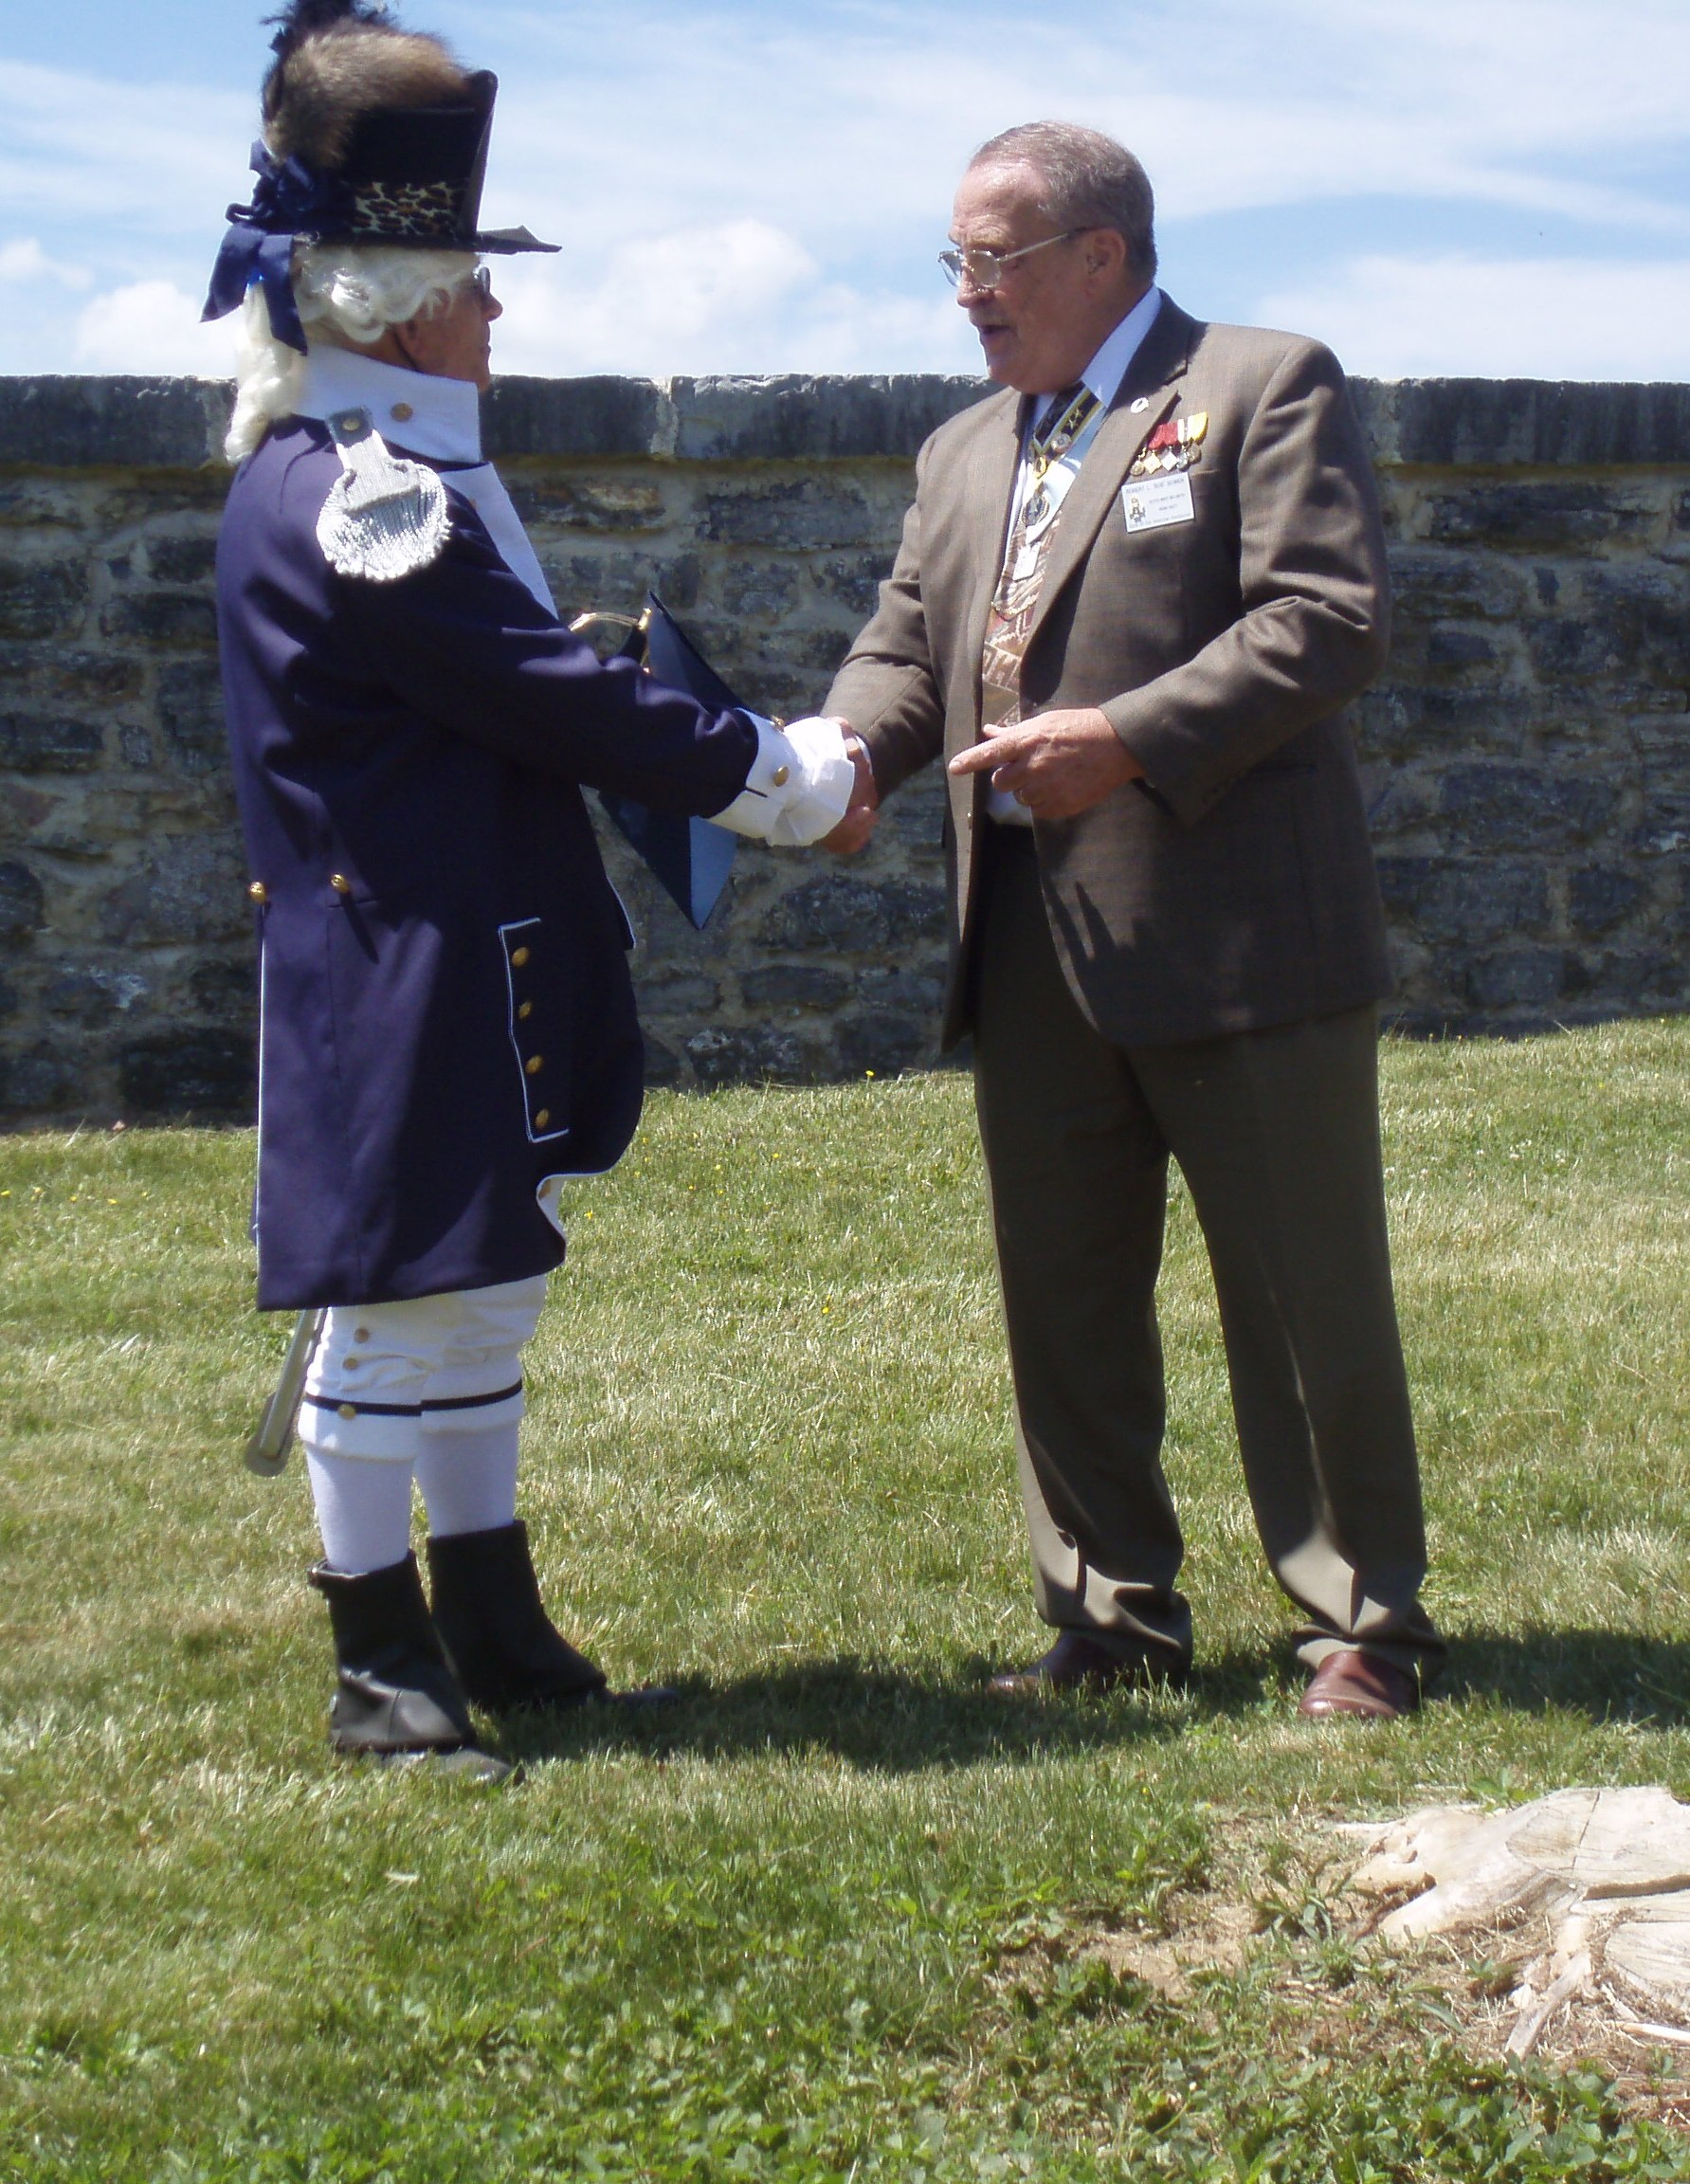 Lyman dressed as Captain, Richmond Lt Inf Blues Receives Certificate